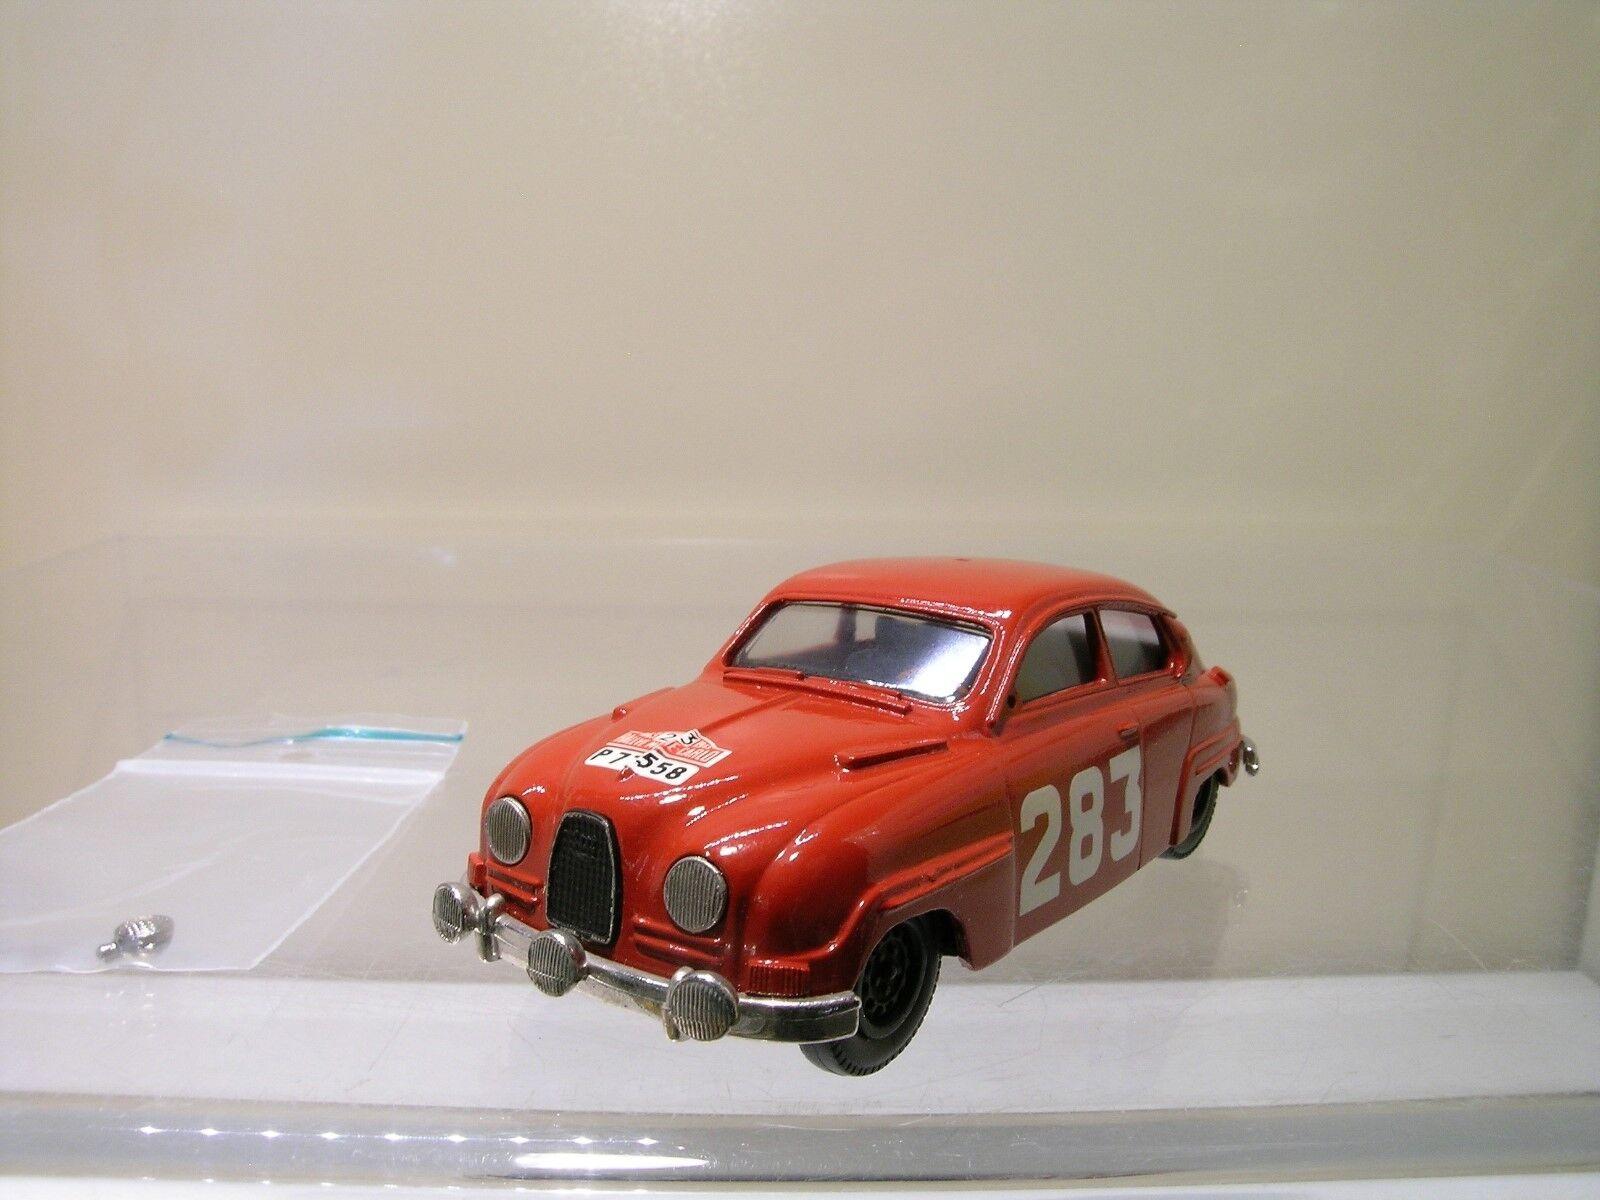 GRAND PRIX MODELS SAAB 96 RALLYE RMC 1963 CARLSSON rosso biancaMETAL HANDB. 1 43